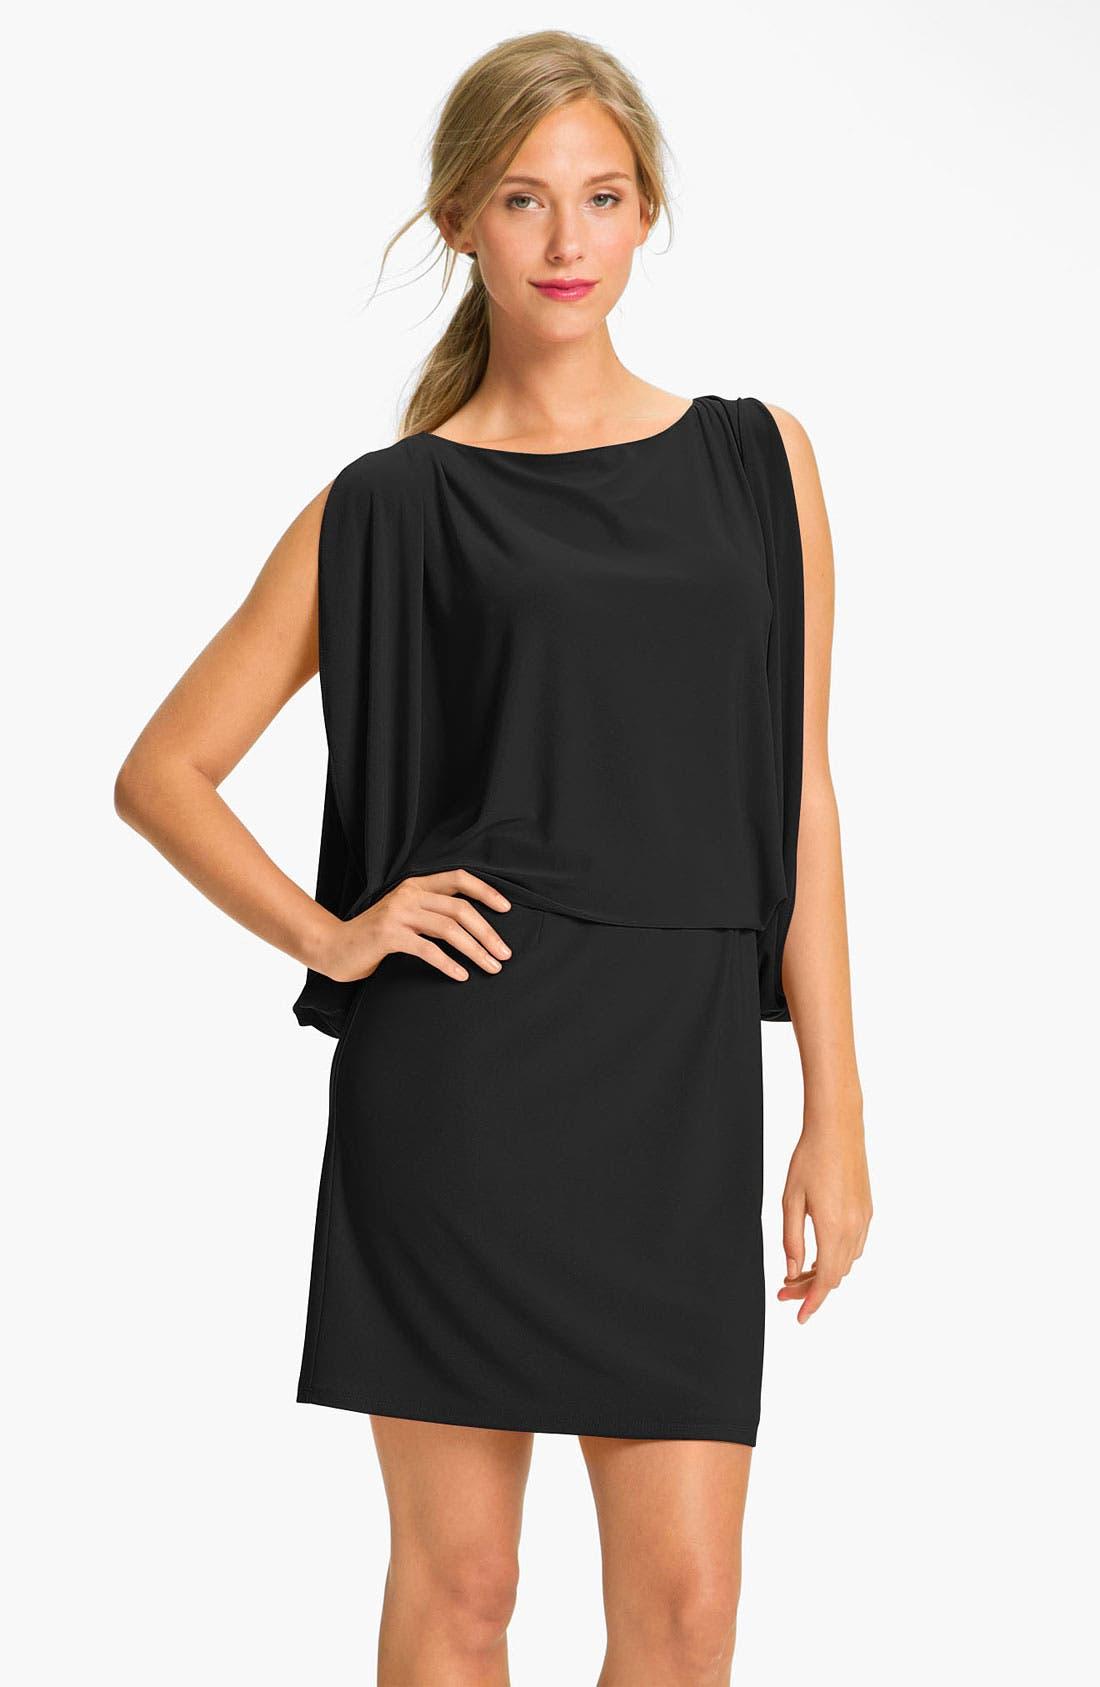 JESSICA SIMPSON Draped Sleeve Jersey Blouson Dress, Main, color, 001